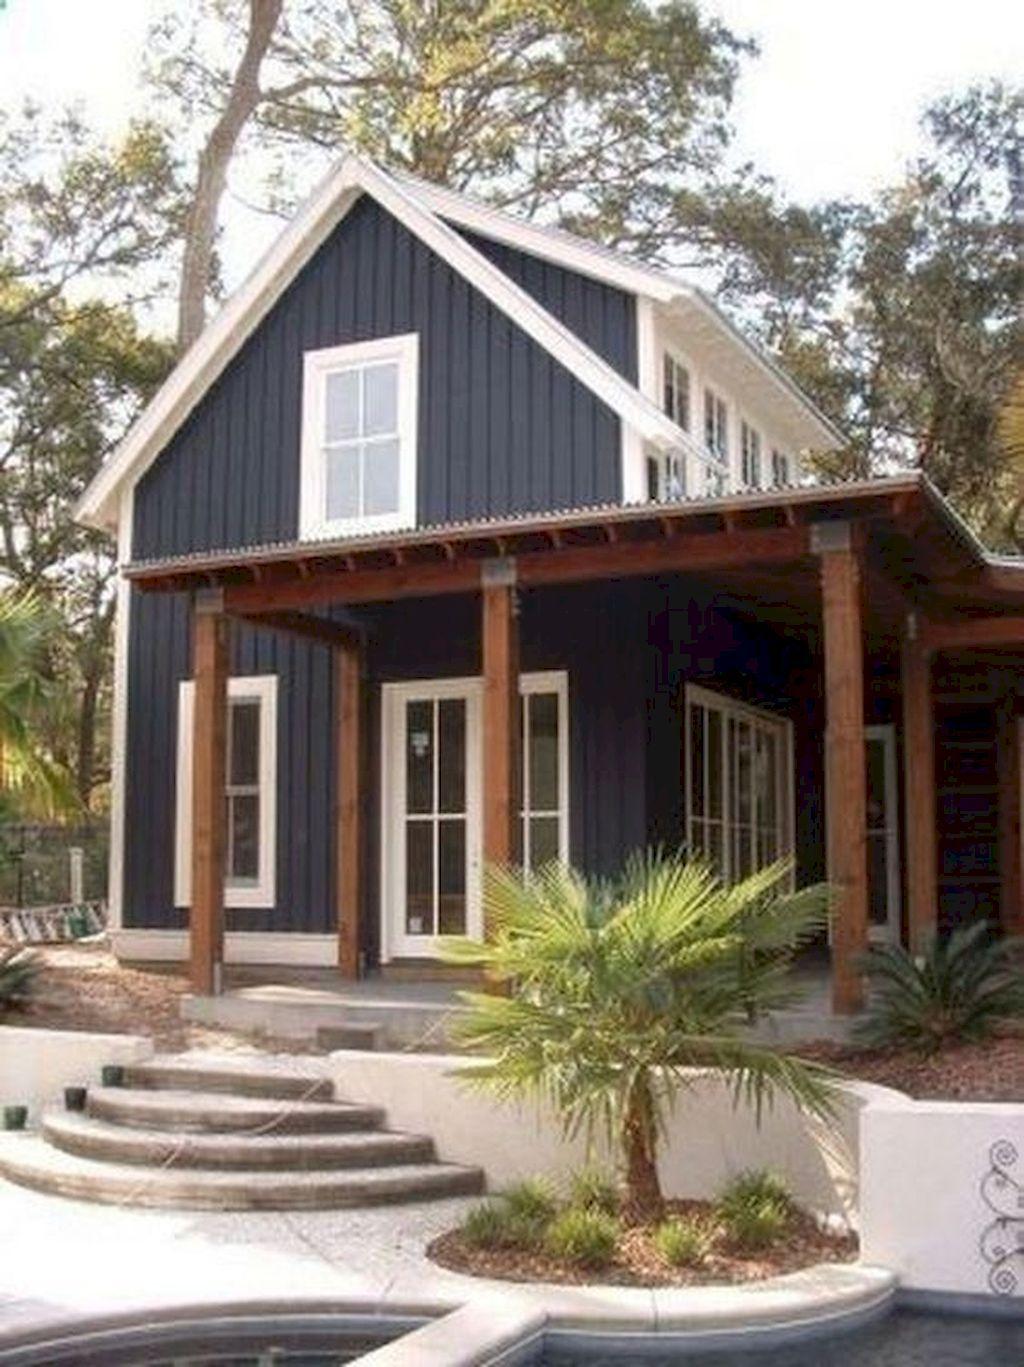 15 best modern farmhouse exterior design ideas in 2020 on beautiful modern farmhouse trending exterior design ideas id=66763